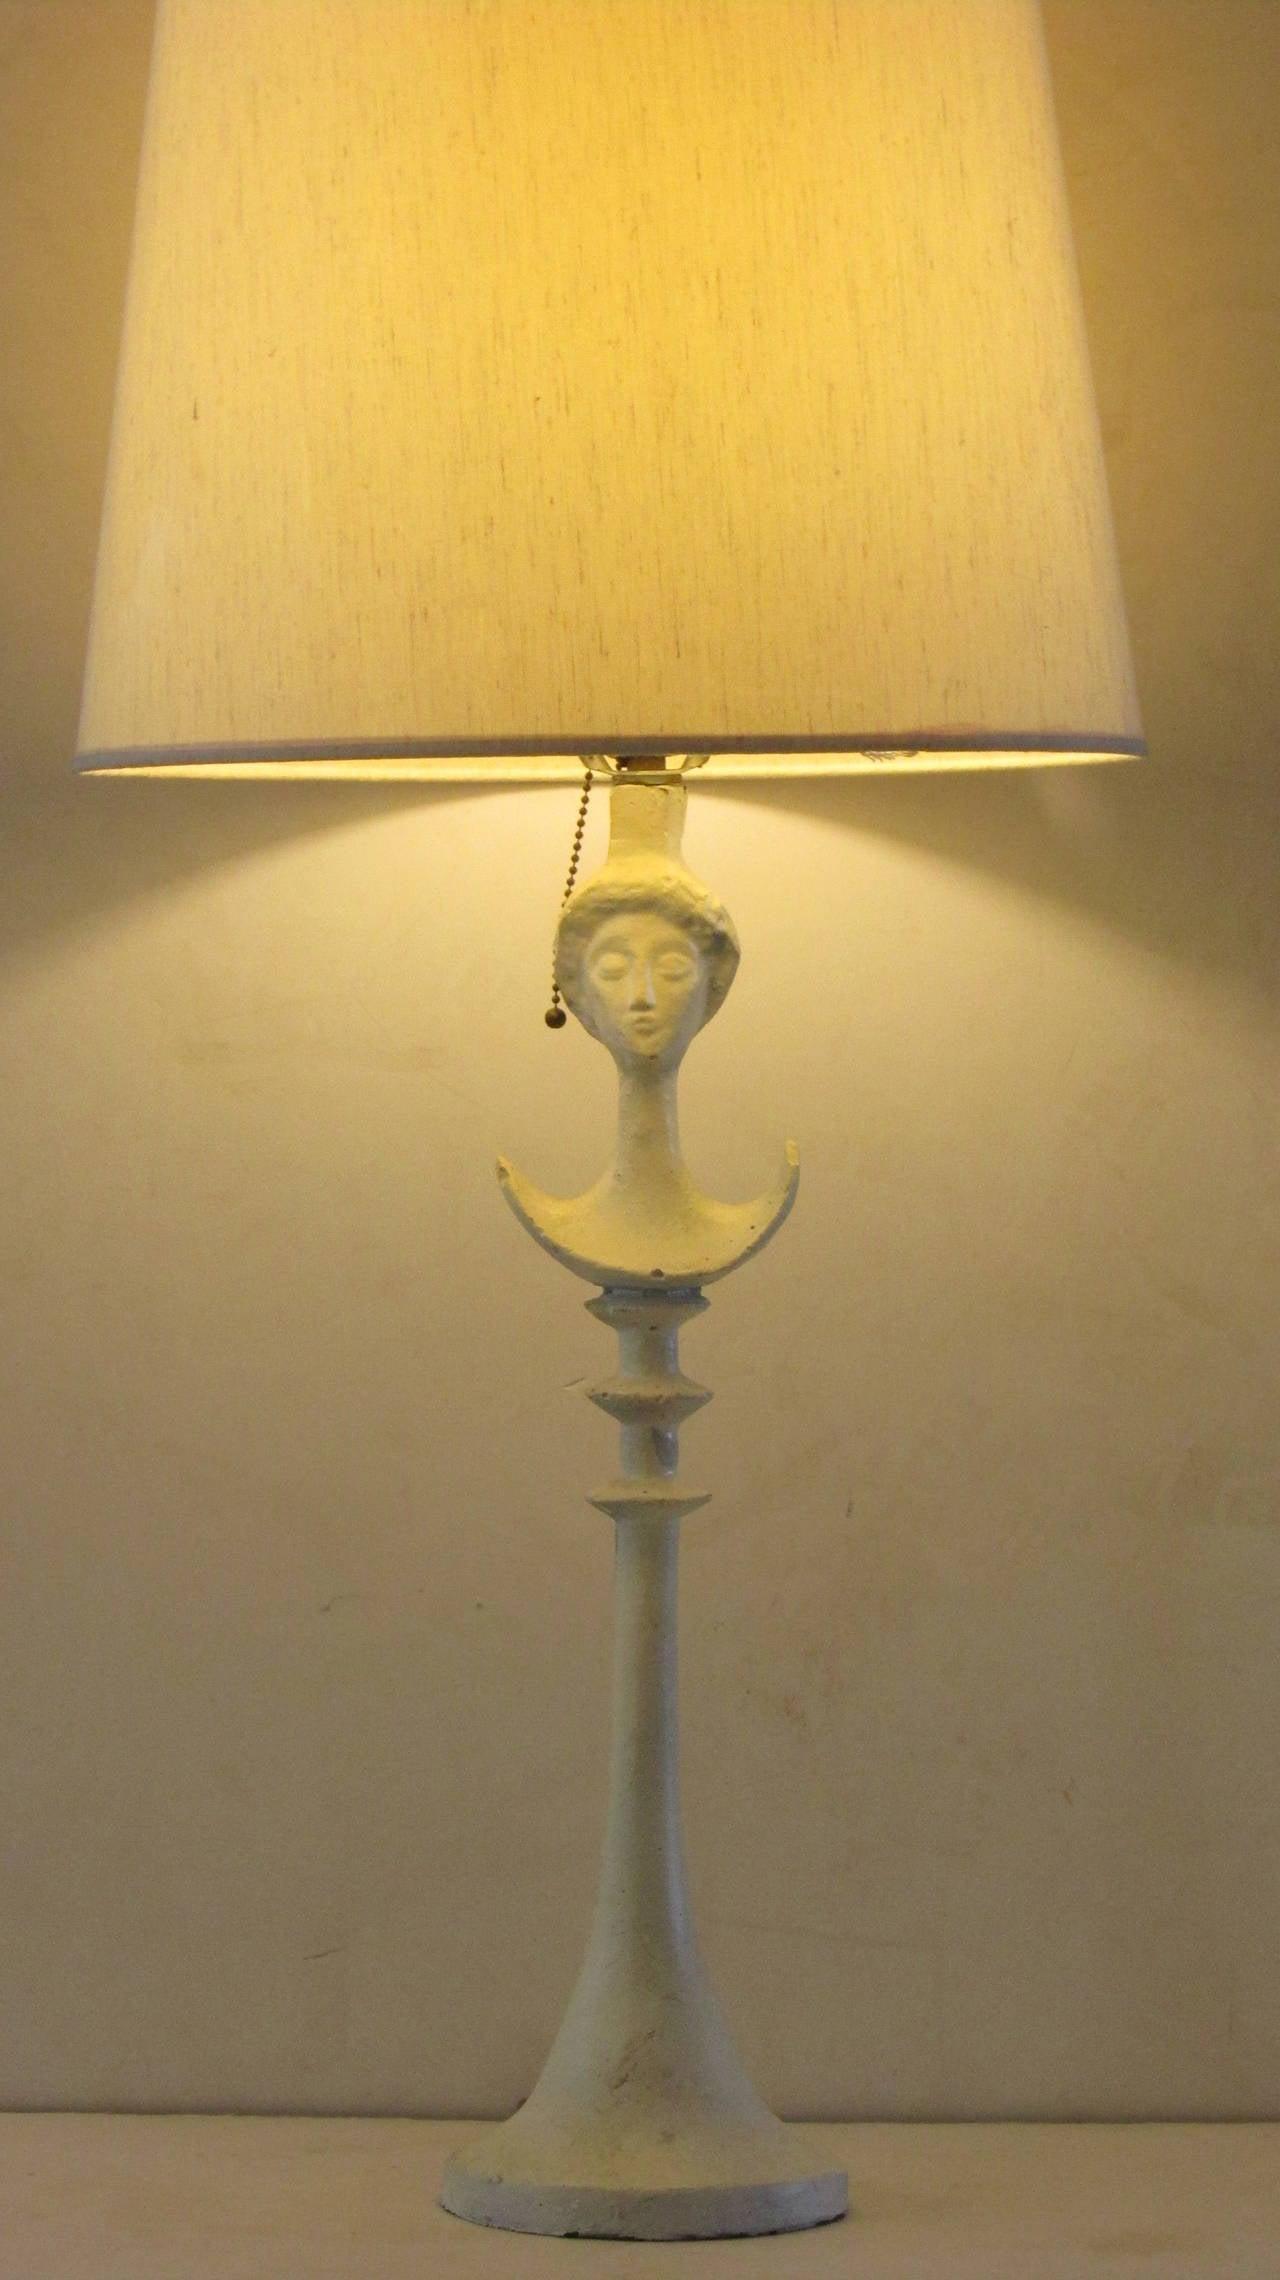 Tete de Femme Table Lamp in the Style of Alberto Giacometti